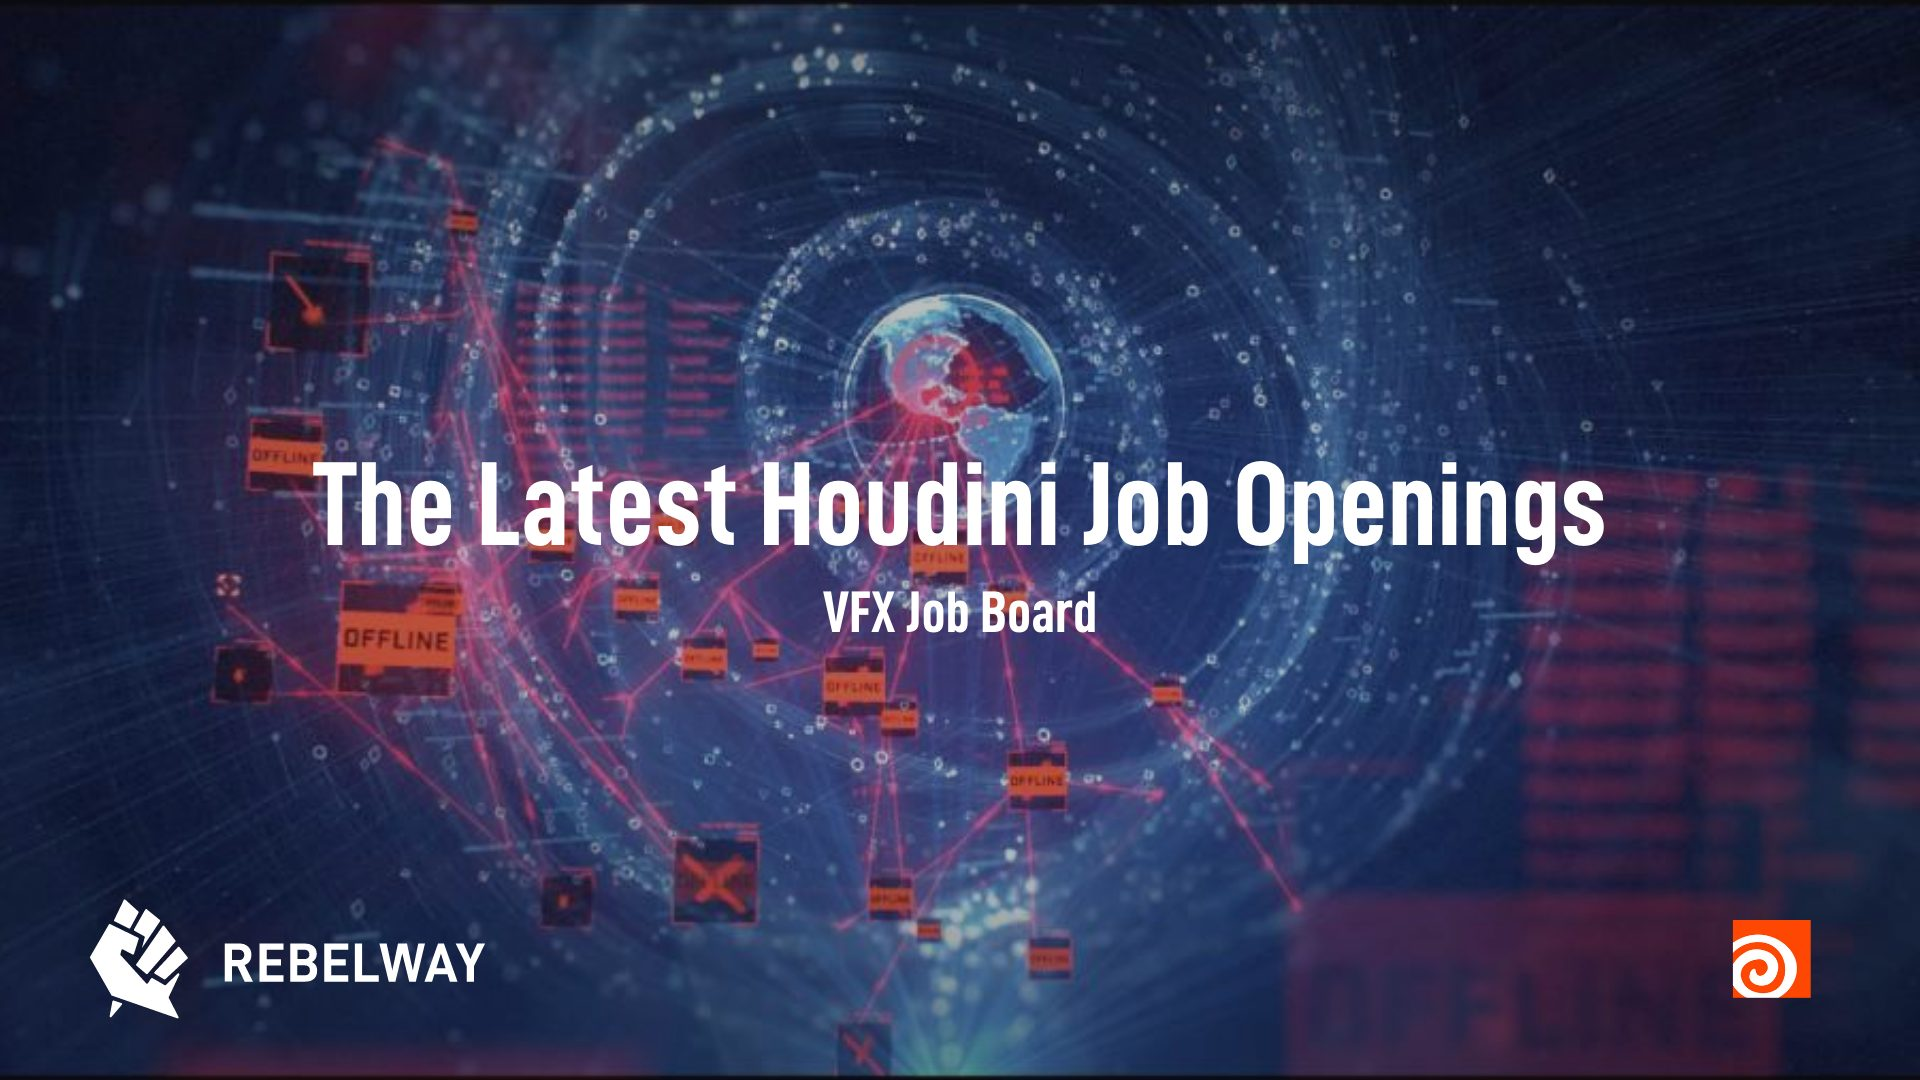 Houdini Job Posts of the Week - 2